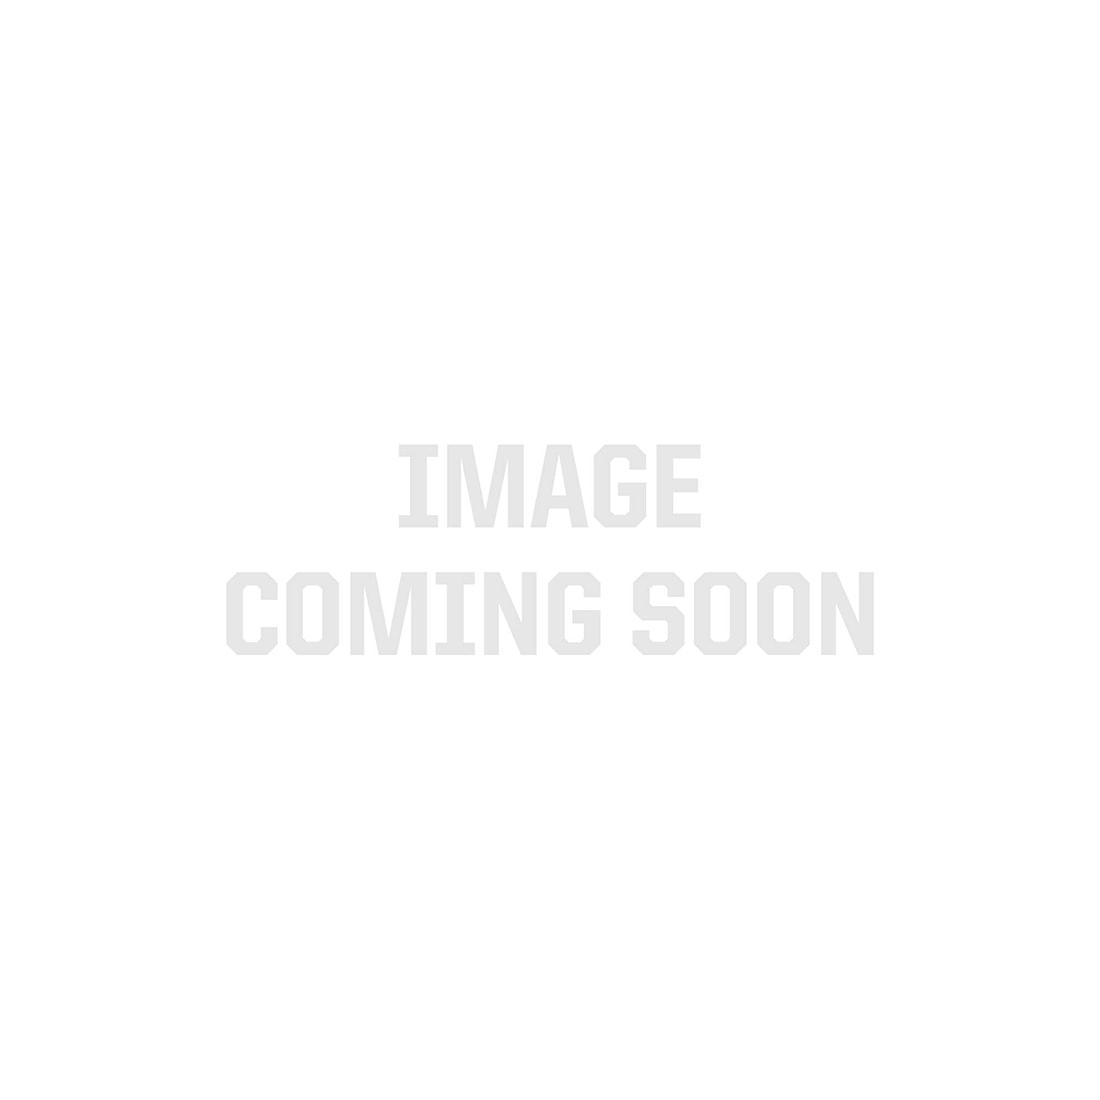 Neutral White 2835 Single Row CurrentControl LED Strip Light, 60/m, 10mm wide, Sample Kit